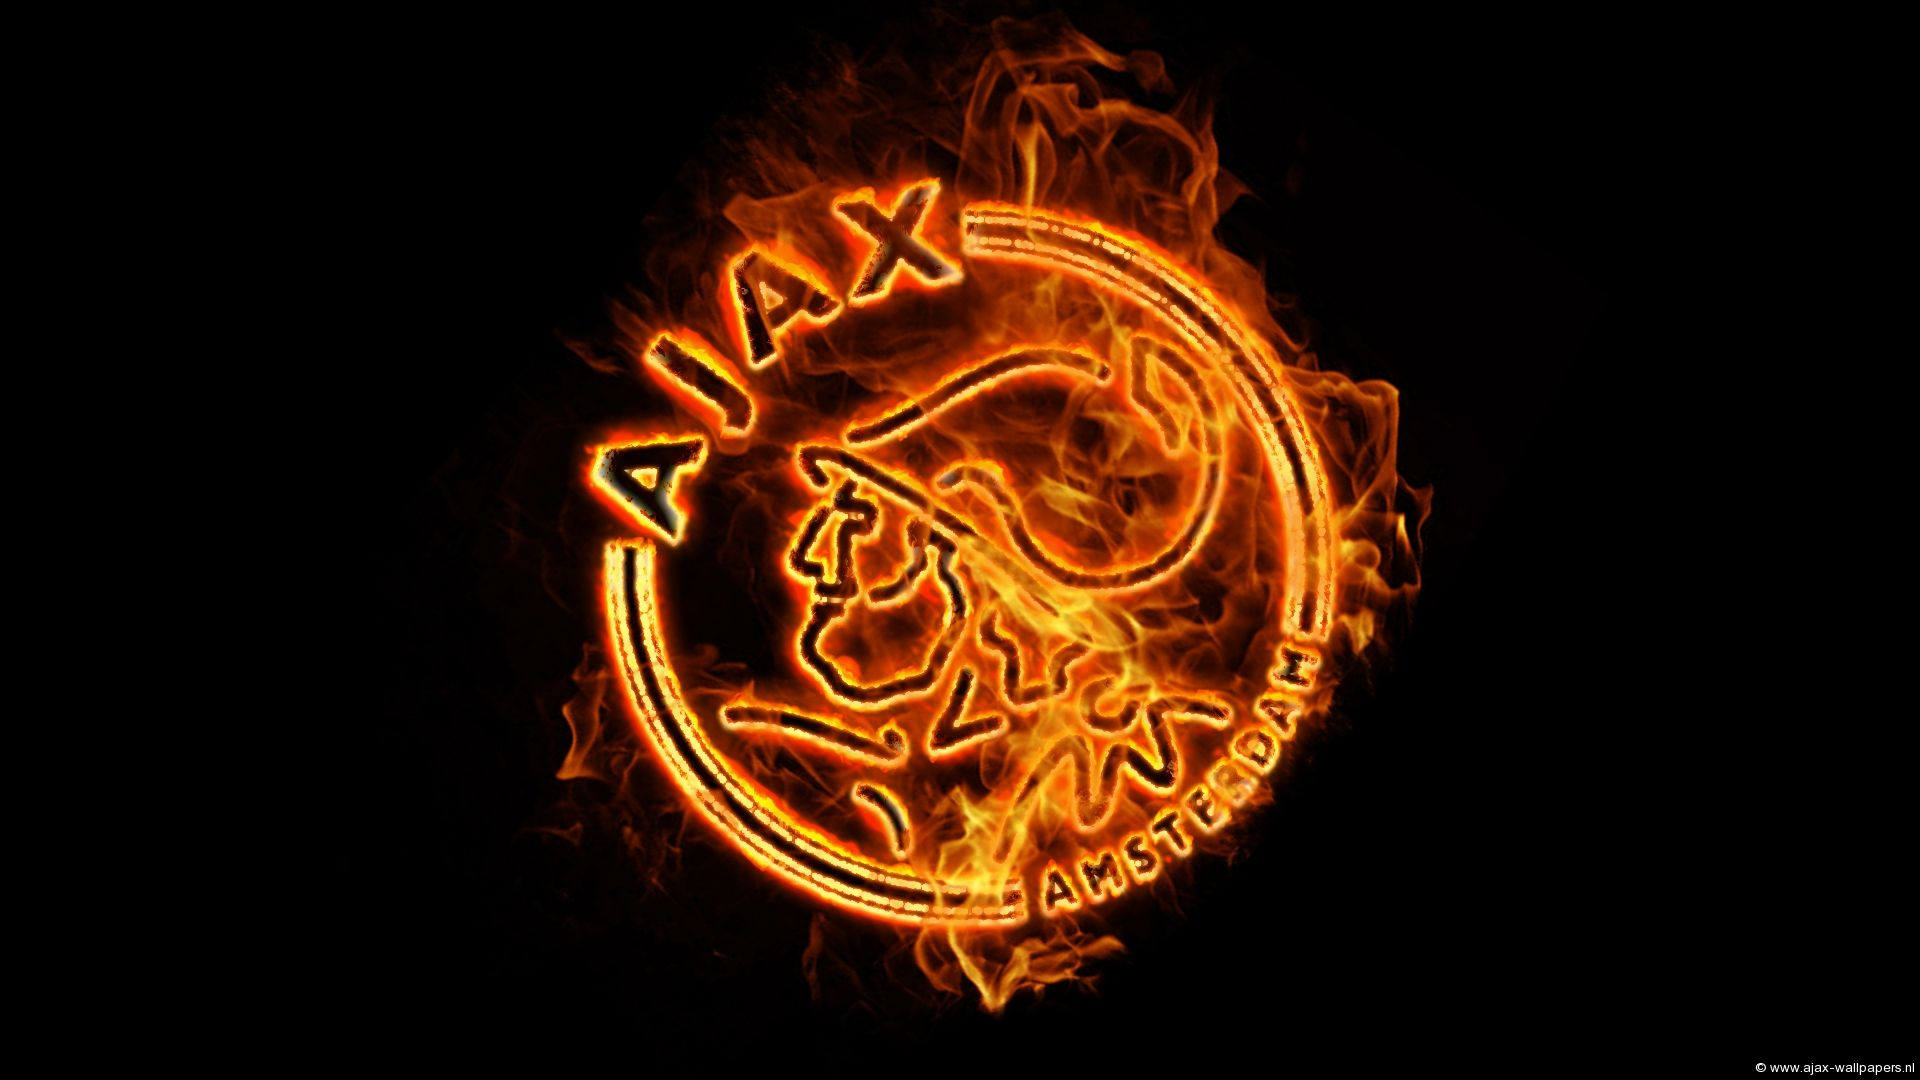 40a763fe9e Ajax!!!!!!!!!!!!!!!! love hun | Rea - Bureaubladachtergronden ...